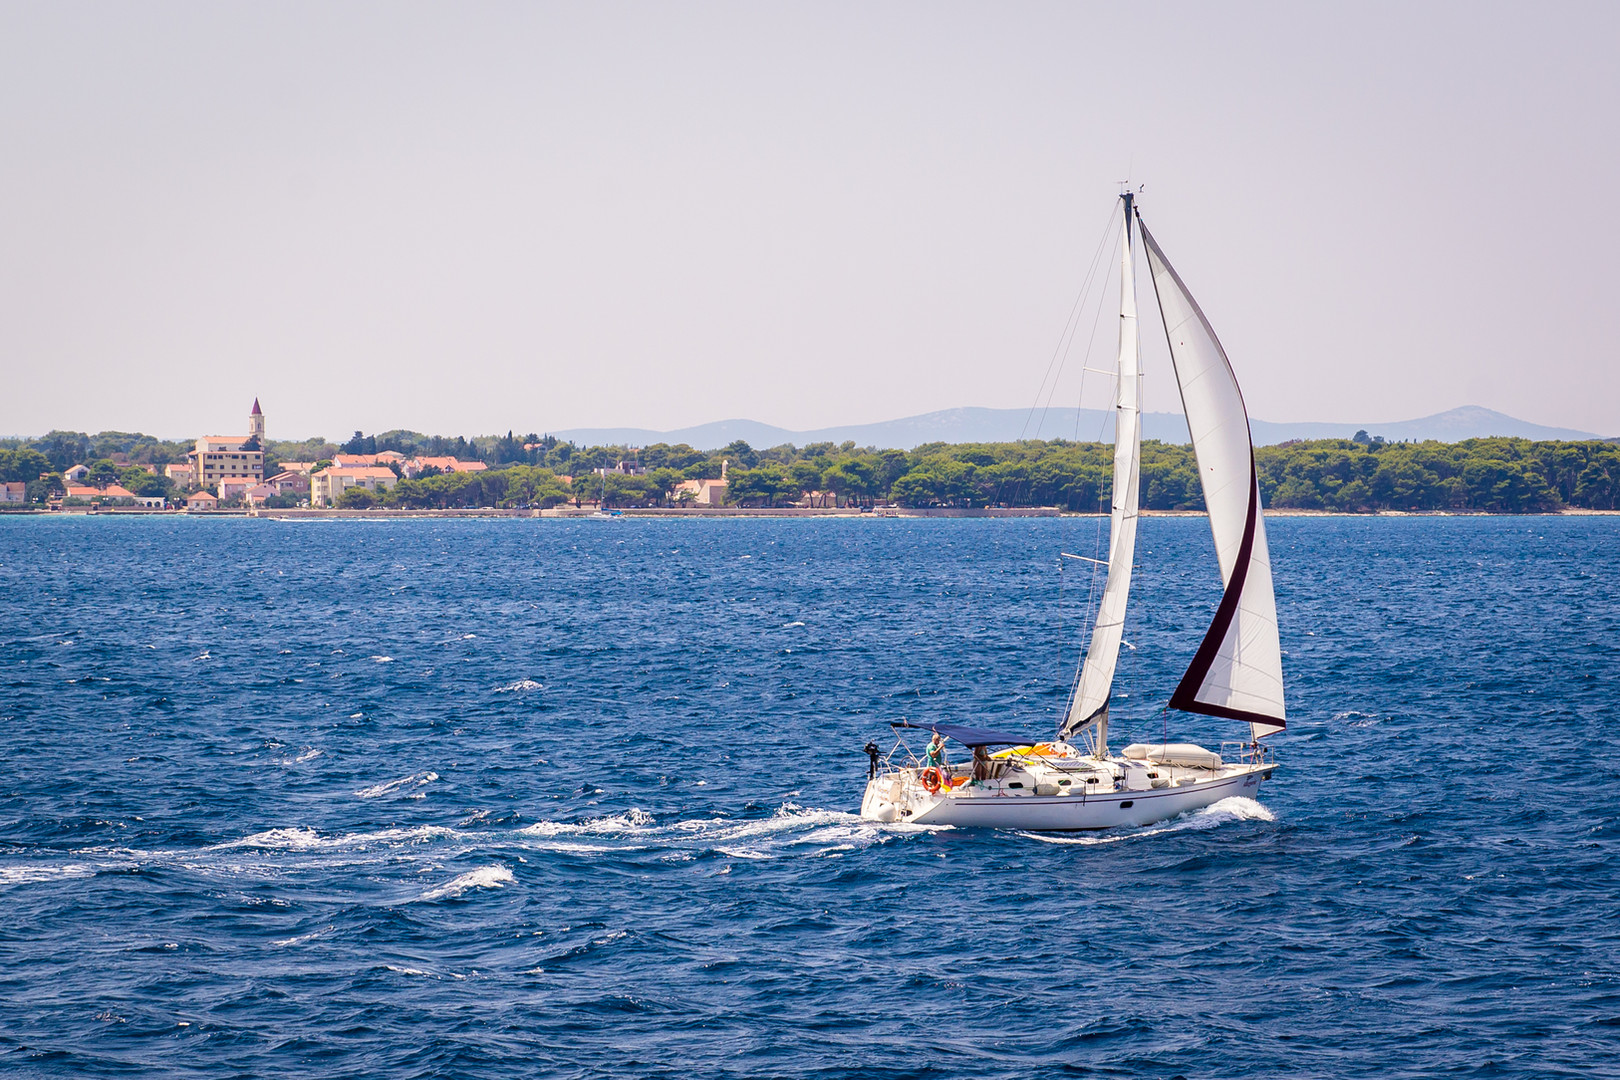 Sailing on the Adriatic Sea